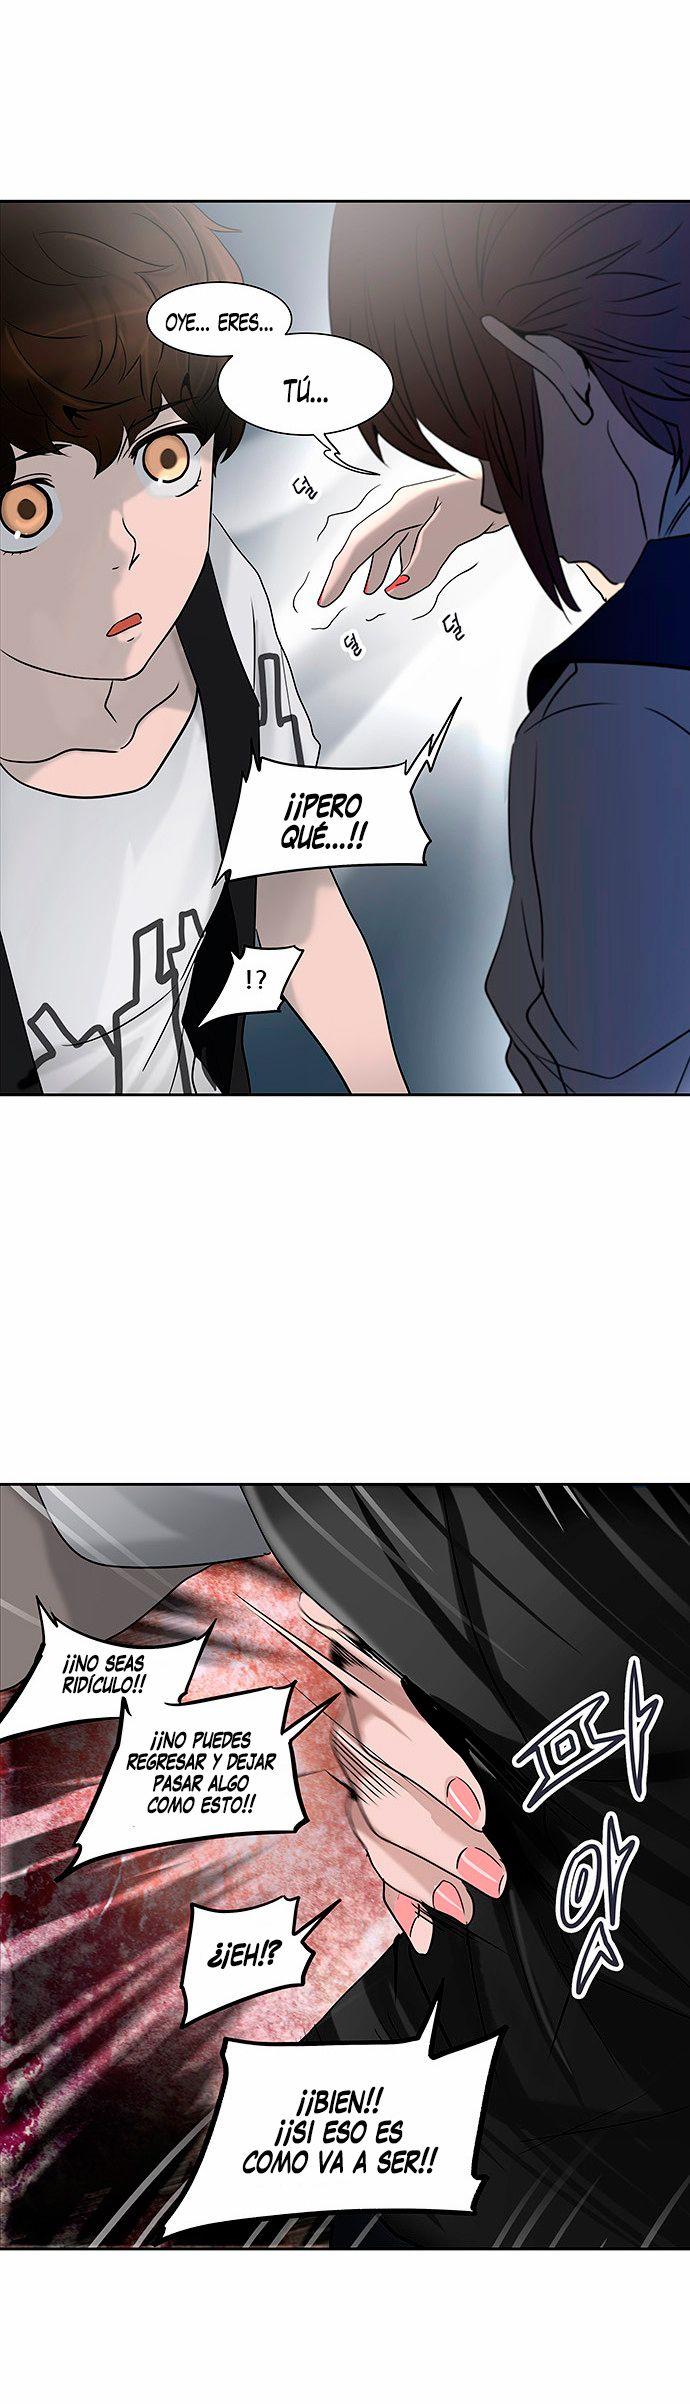 http://c5.ninemanga.com/es_manga/21/149/482912/ccf2d76e0c41868d7ad86138ea56ad67.jpg Page 5